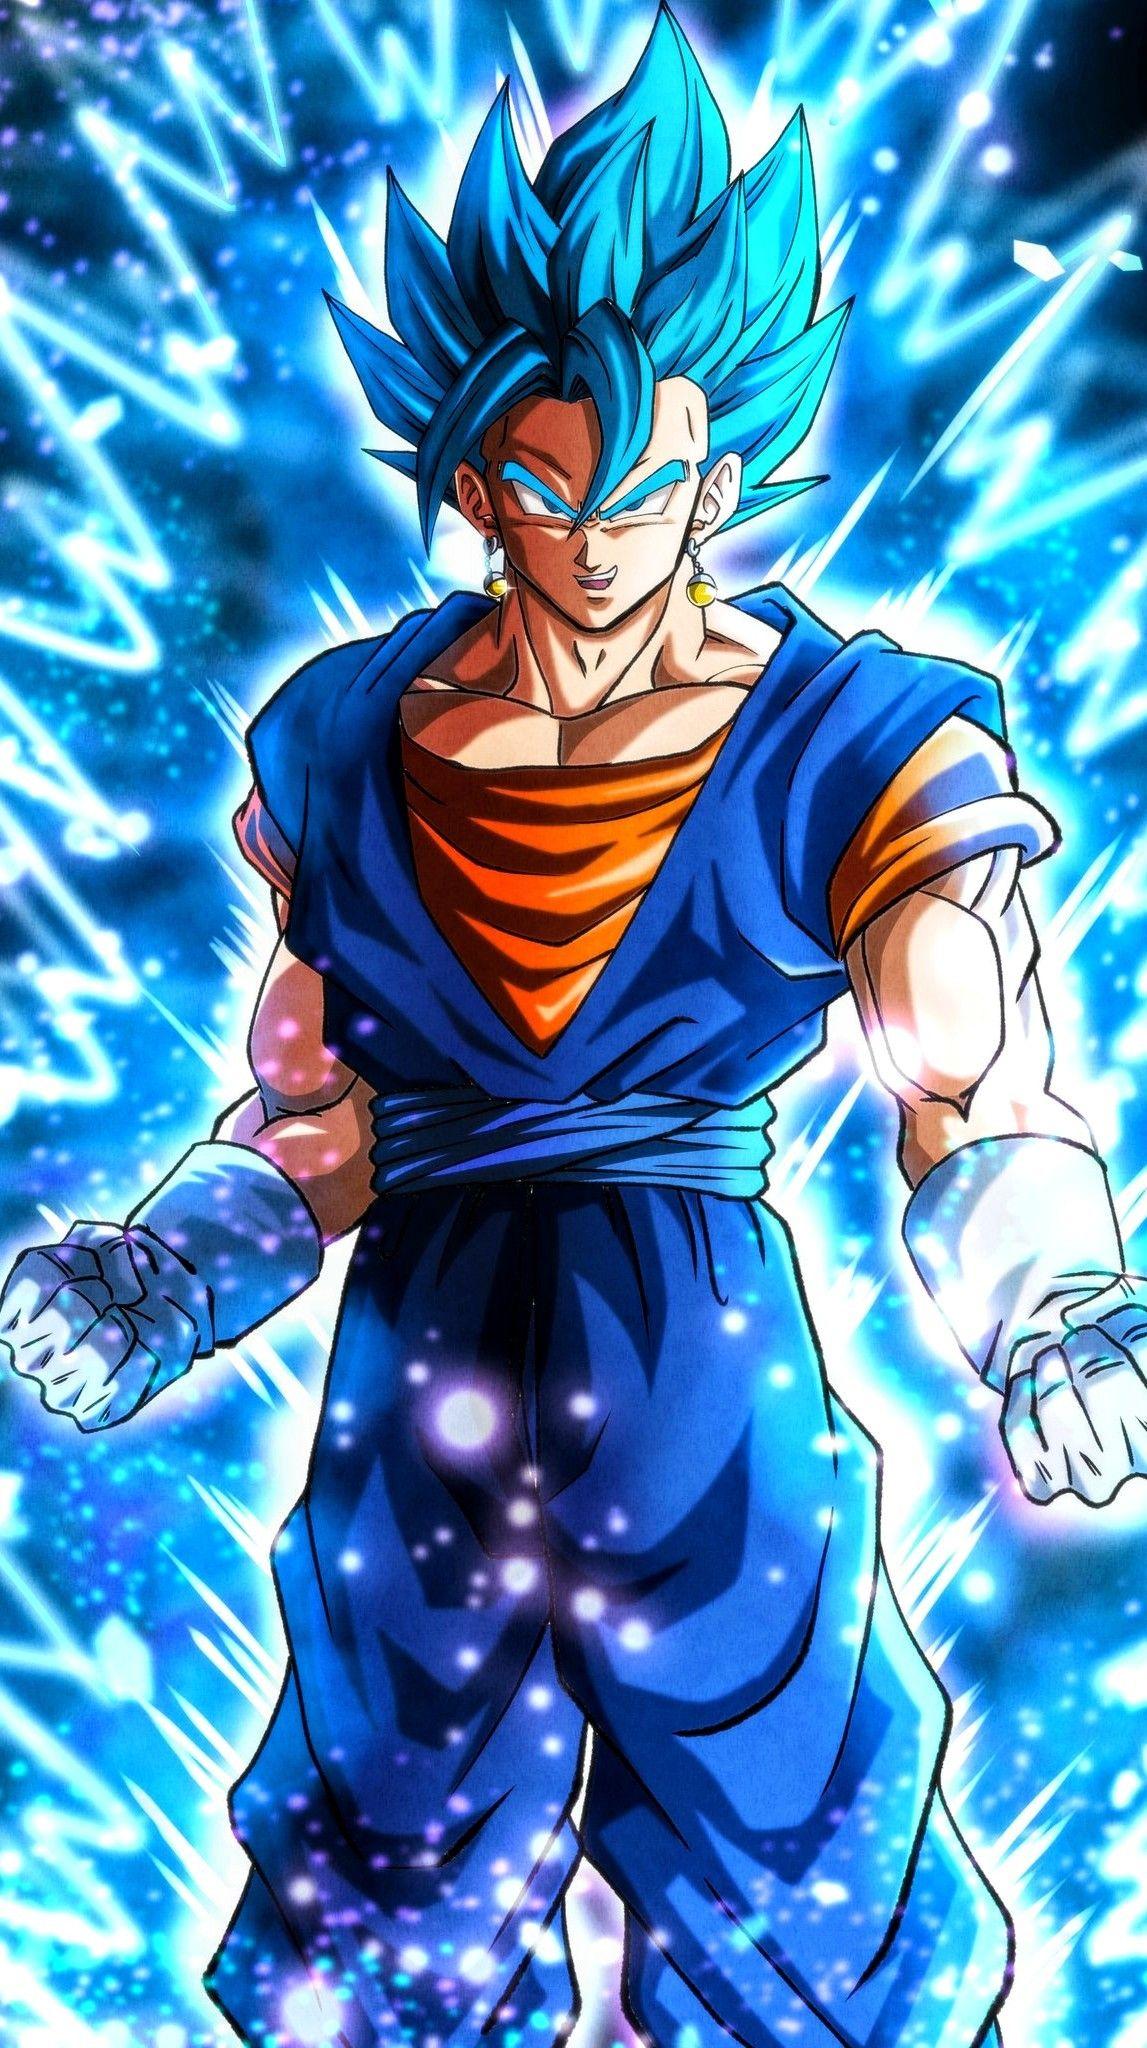 Vegito Blue Anime Dragon Ball Super Dragon Ball Super Artwork Dragon Ball Super Goku